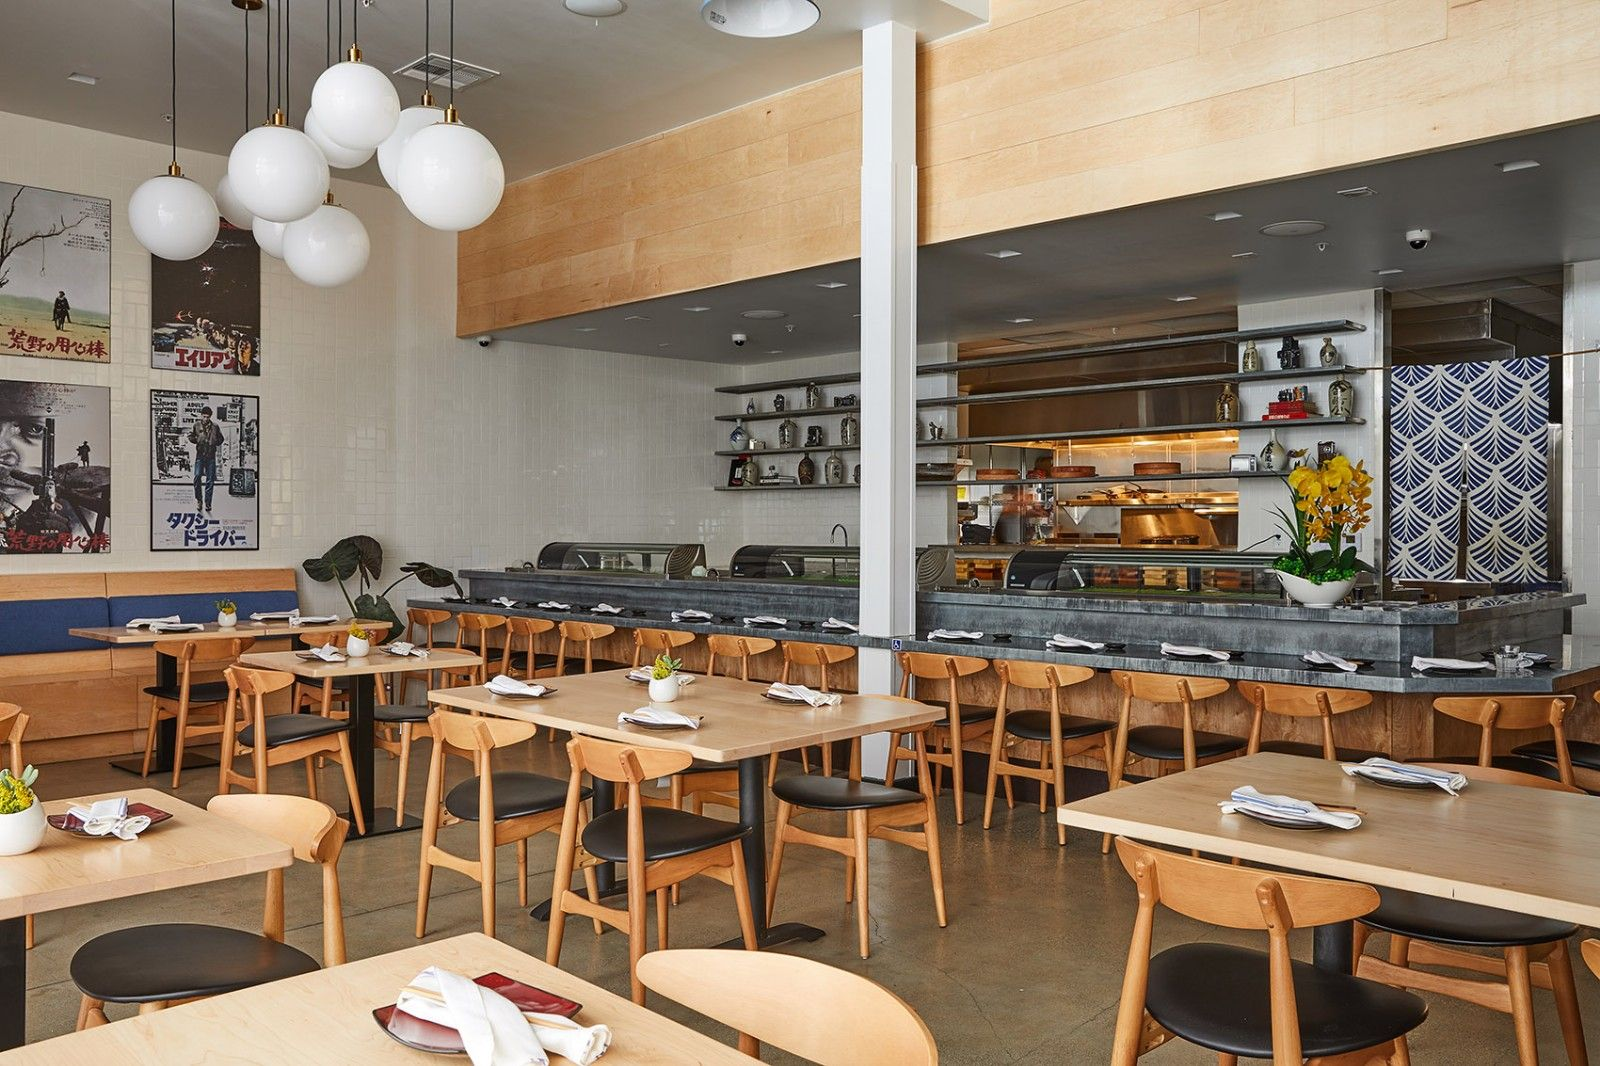 与日本纹身艺术结合的餐厅·洛杉矶清酒道场   Wick Architecture & Design and LAND Design Studio